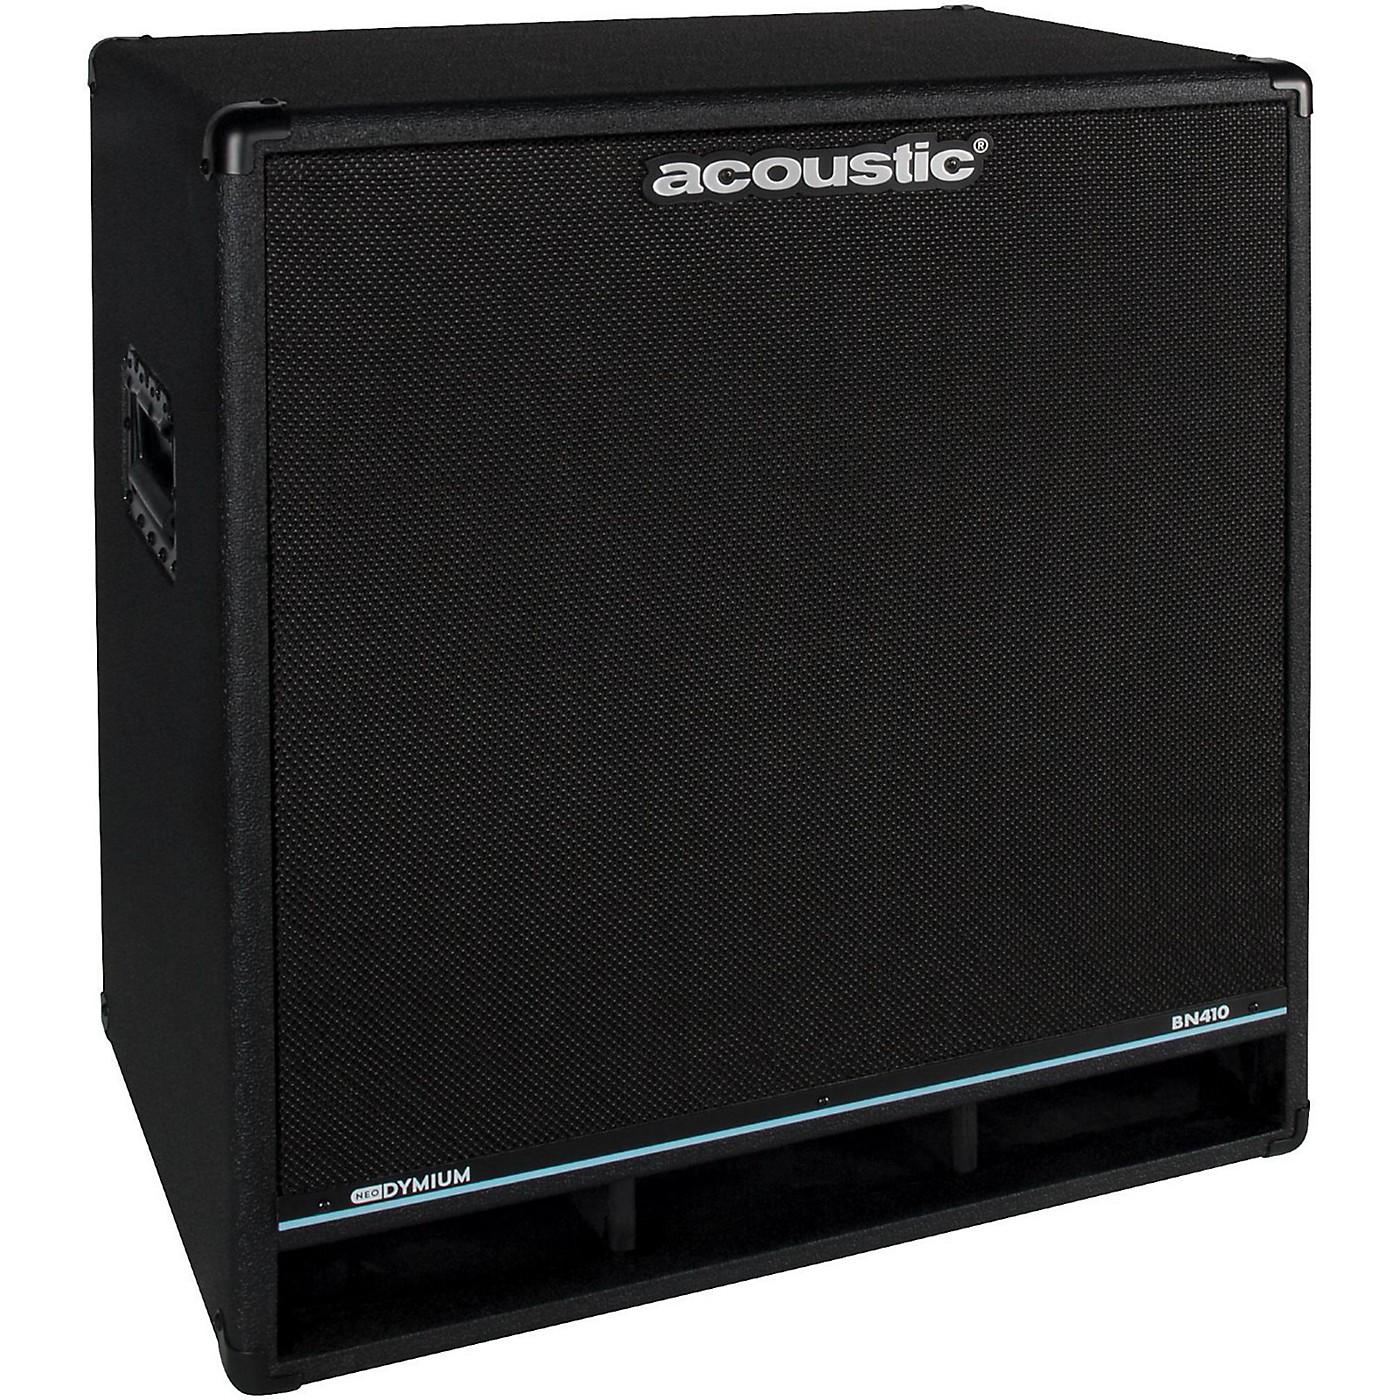 Acoustic BN410 800W 4x10 Bass Speaker Cabinet thumbnail